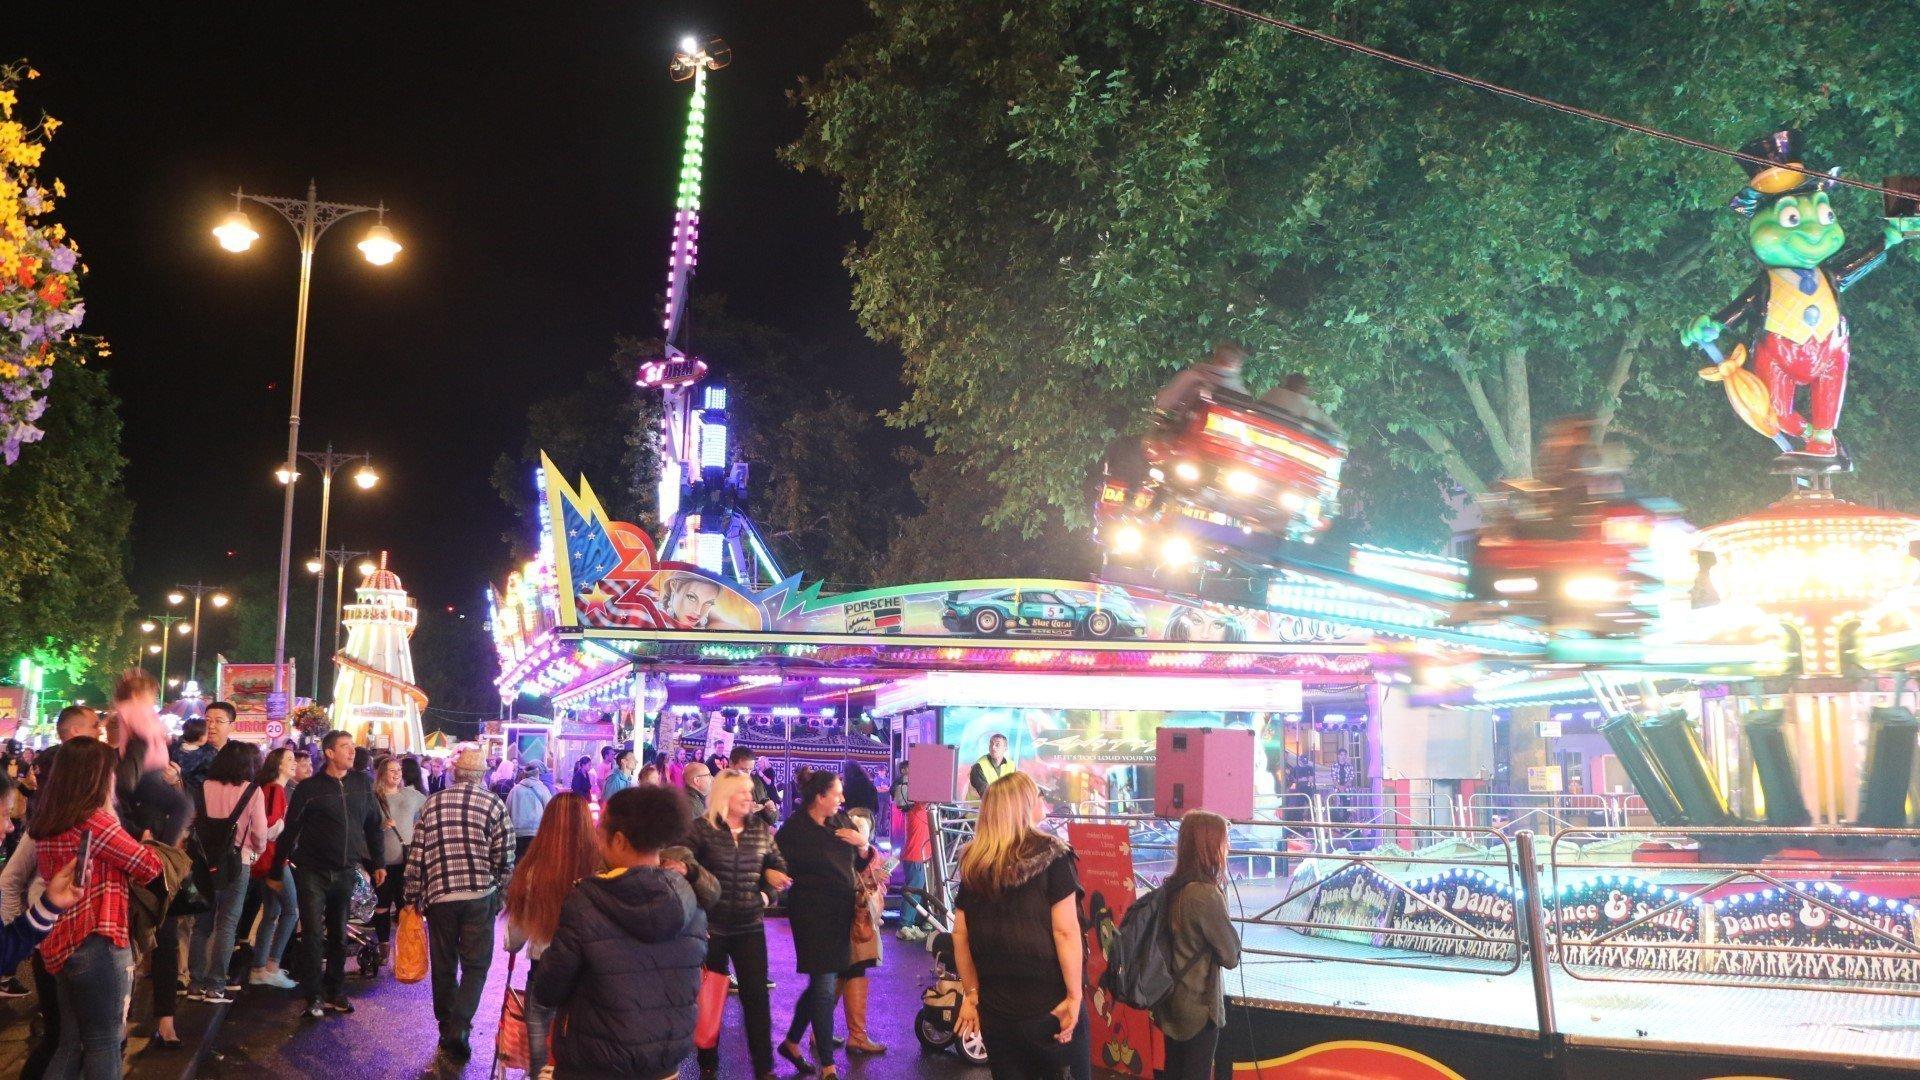 St Giles' Fair 2021 at Oxford City Centre